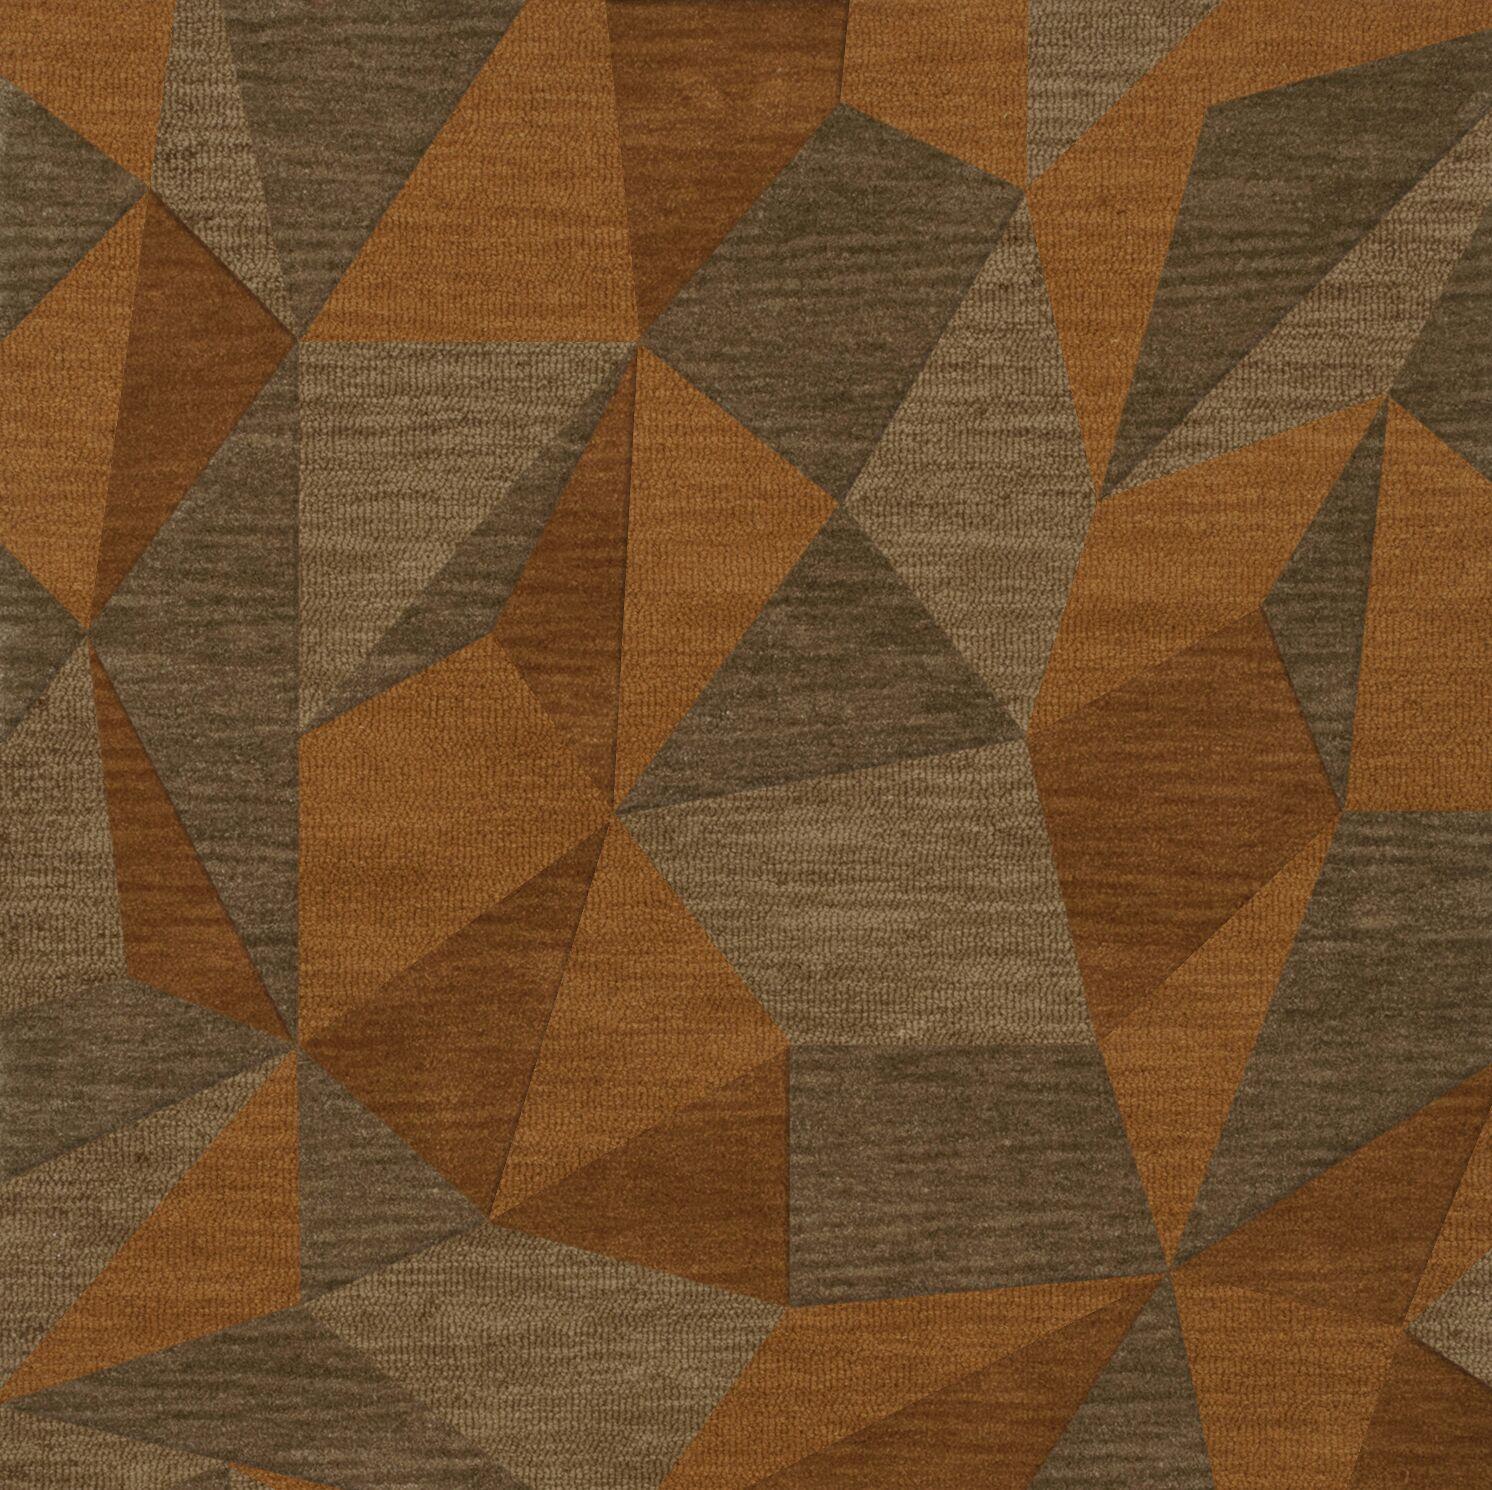 Bella Machine Woven Wool Orange/Brown  Area Rug Rug Size: Square 4'